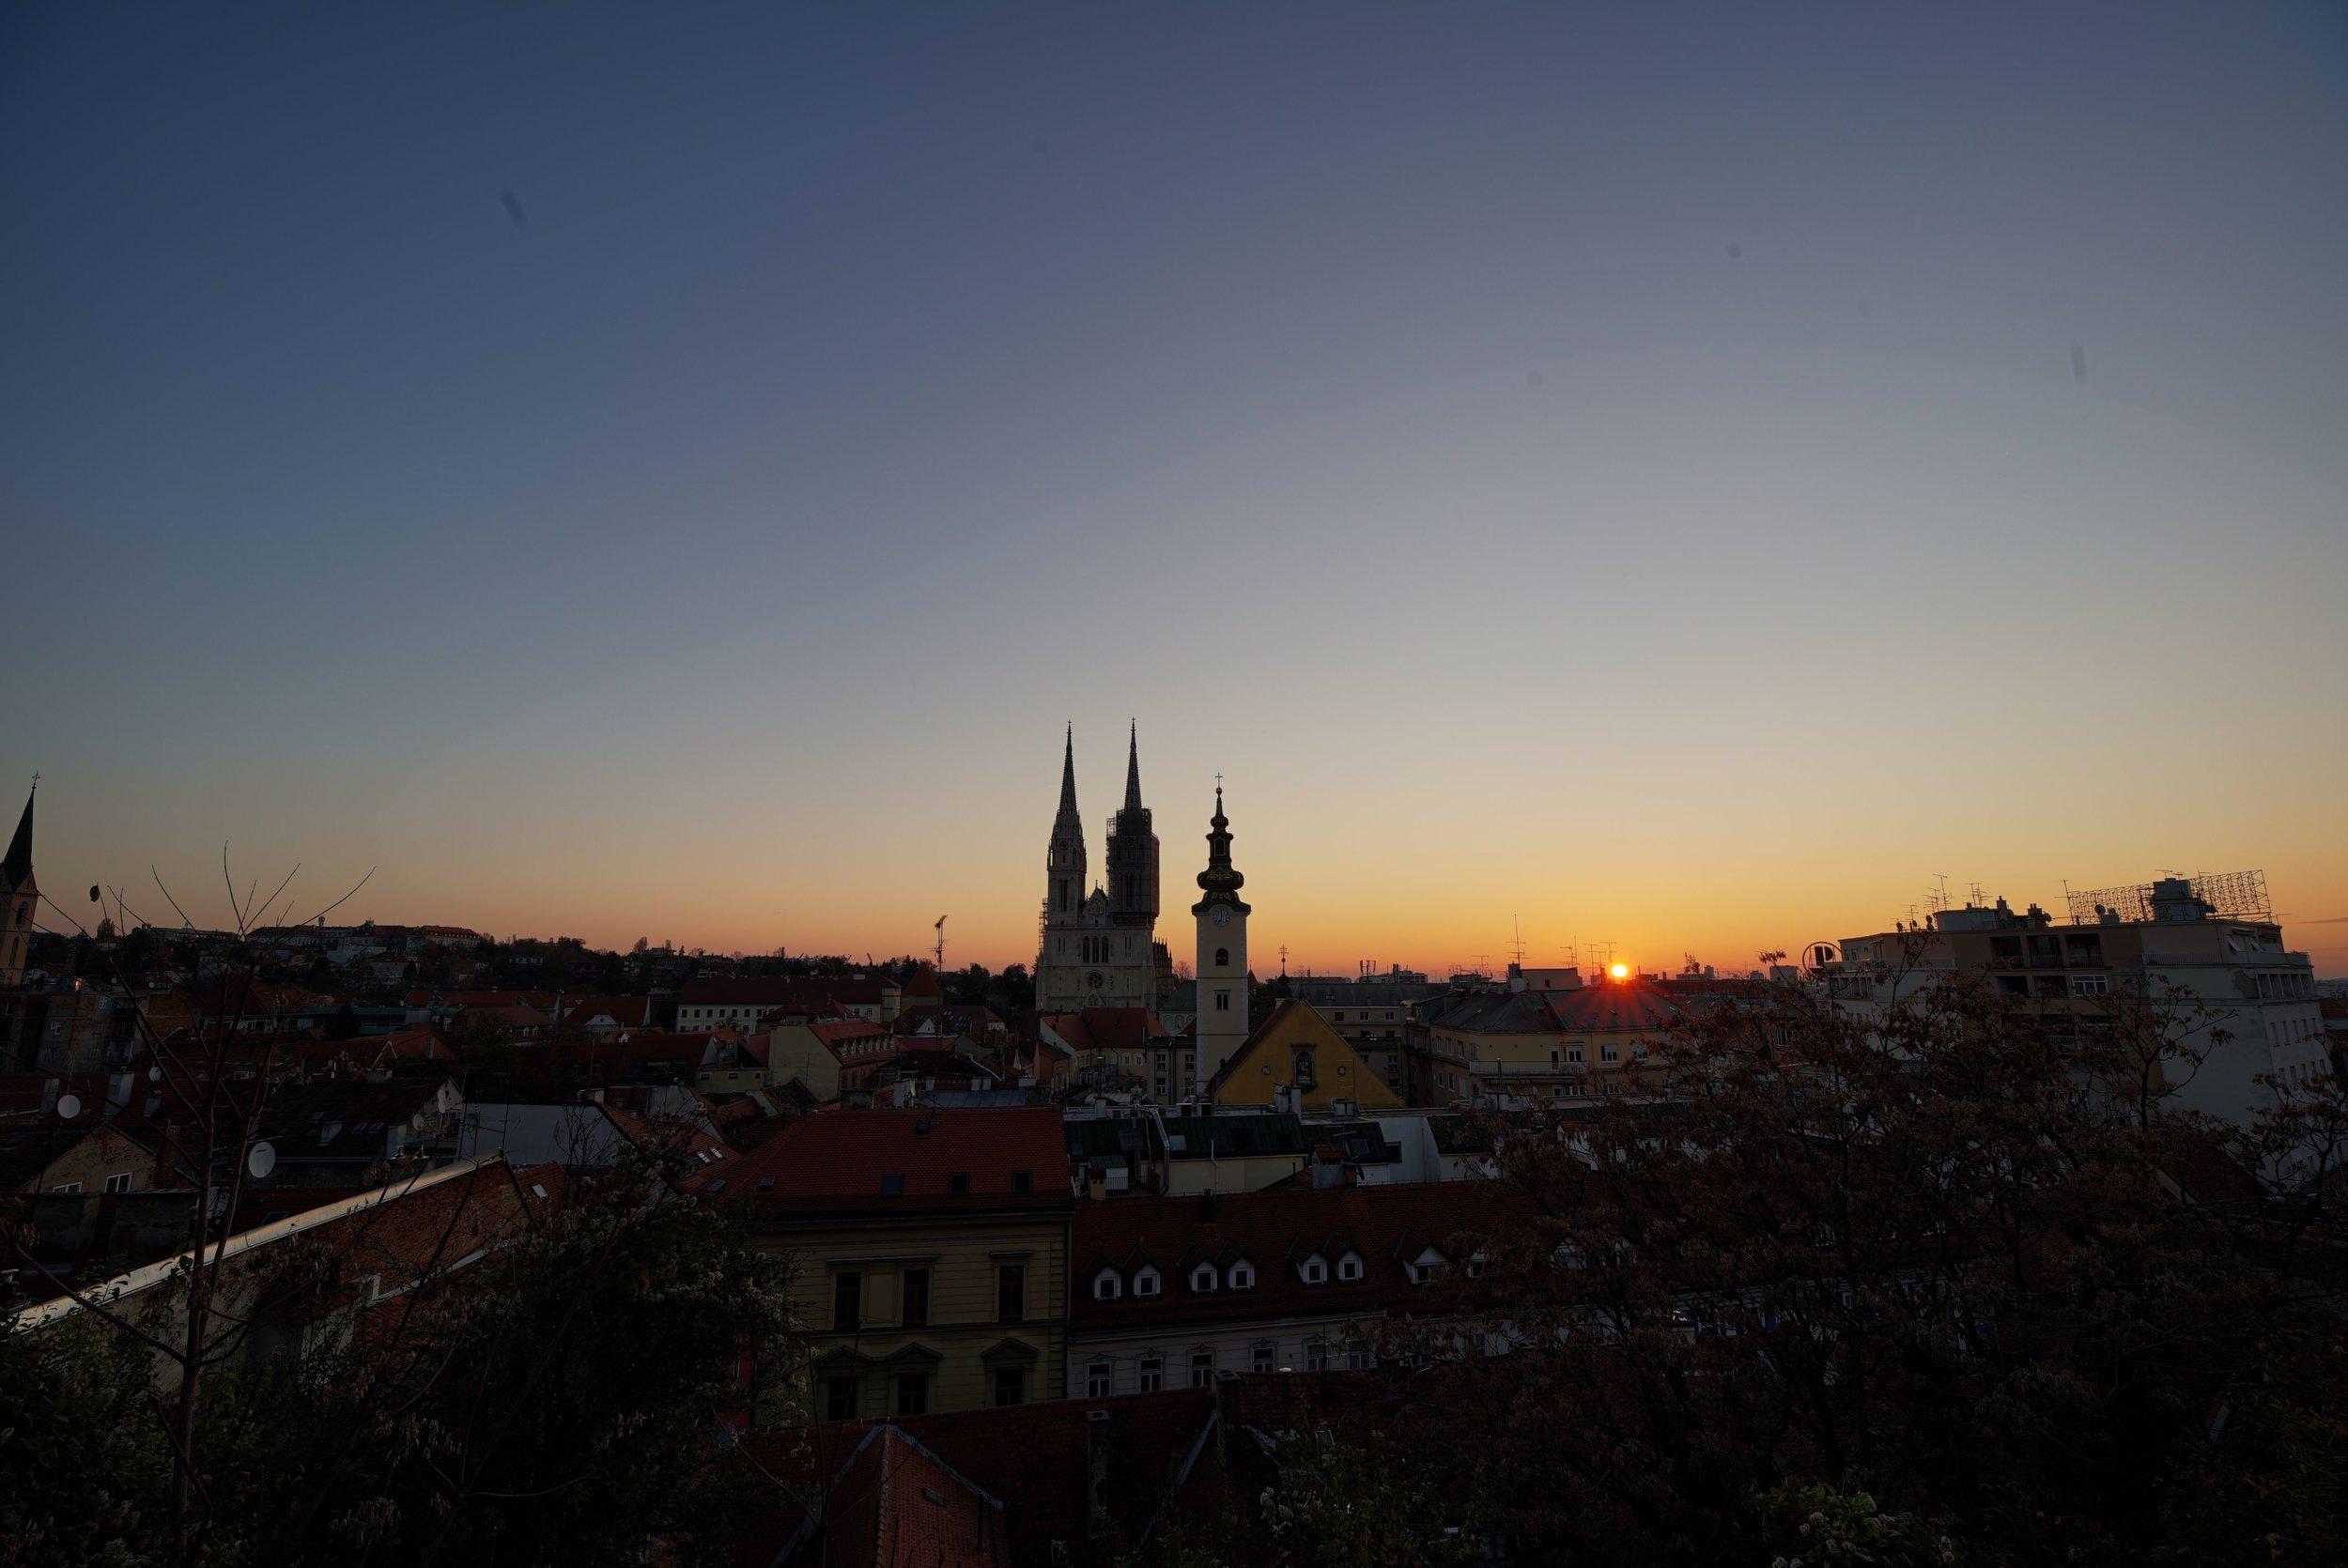 HDR_sunrise_00259.jpg